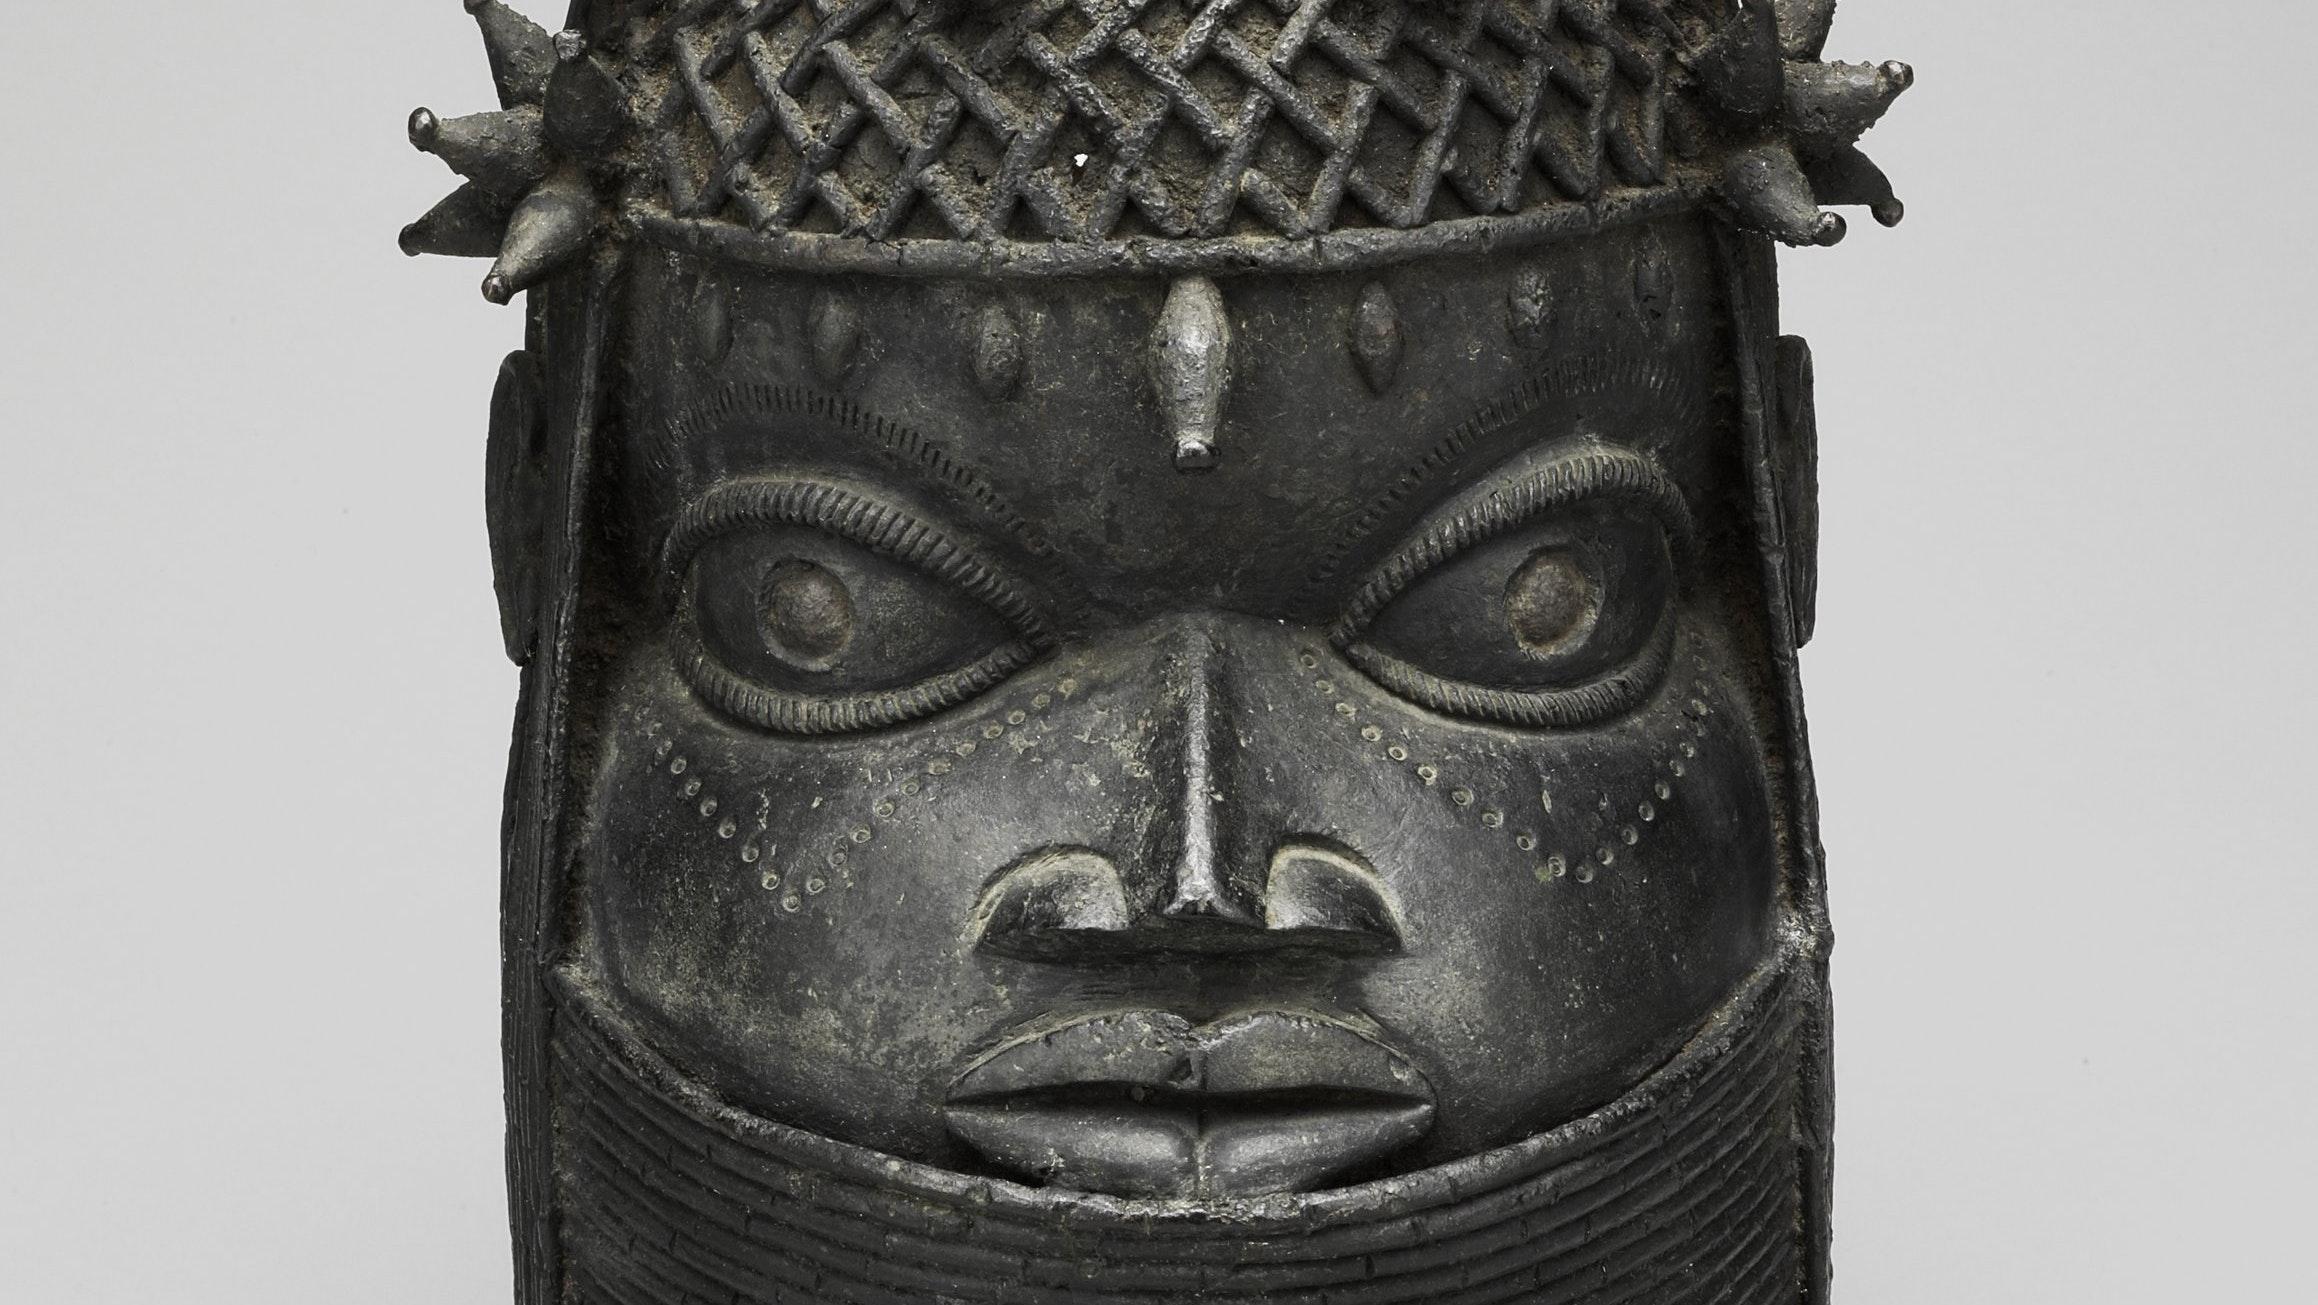 2003.16 Edo Altar Head For An Oba